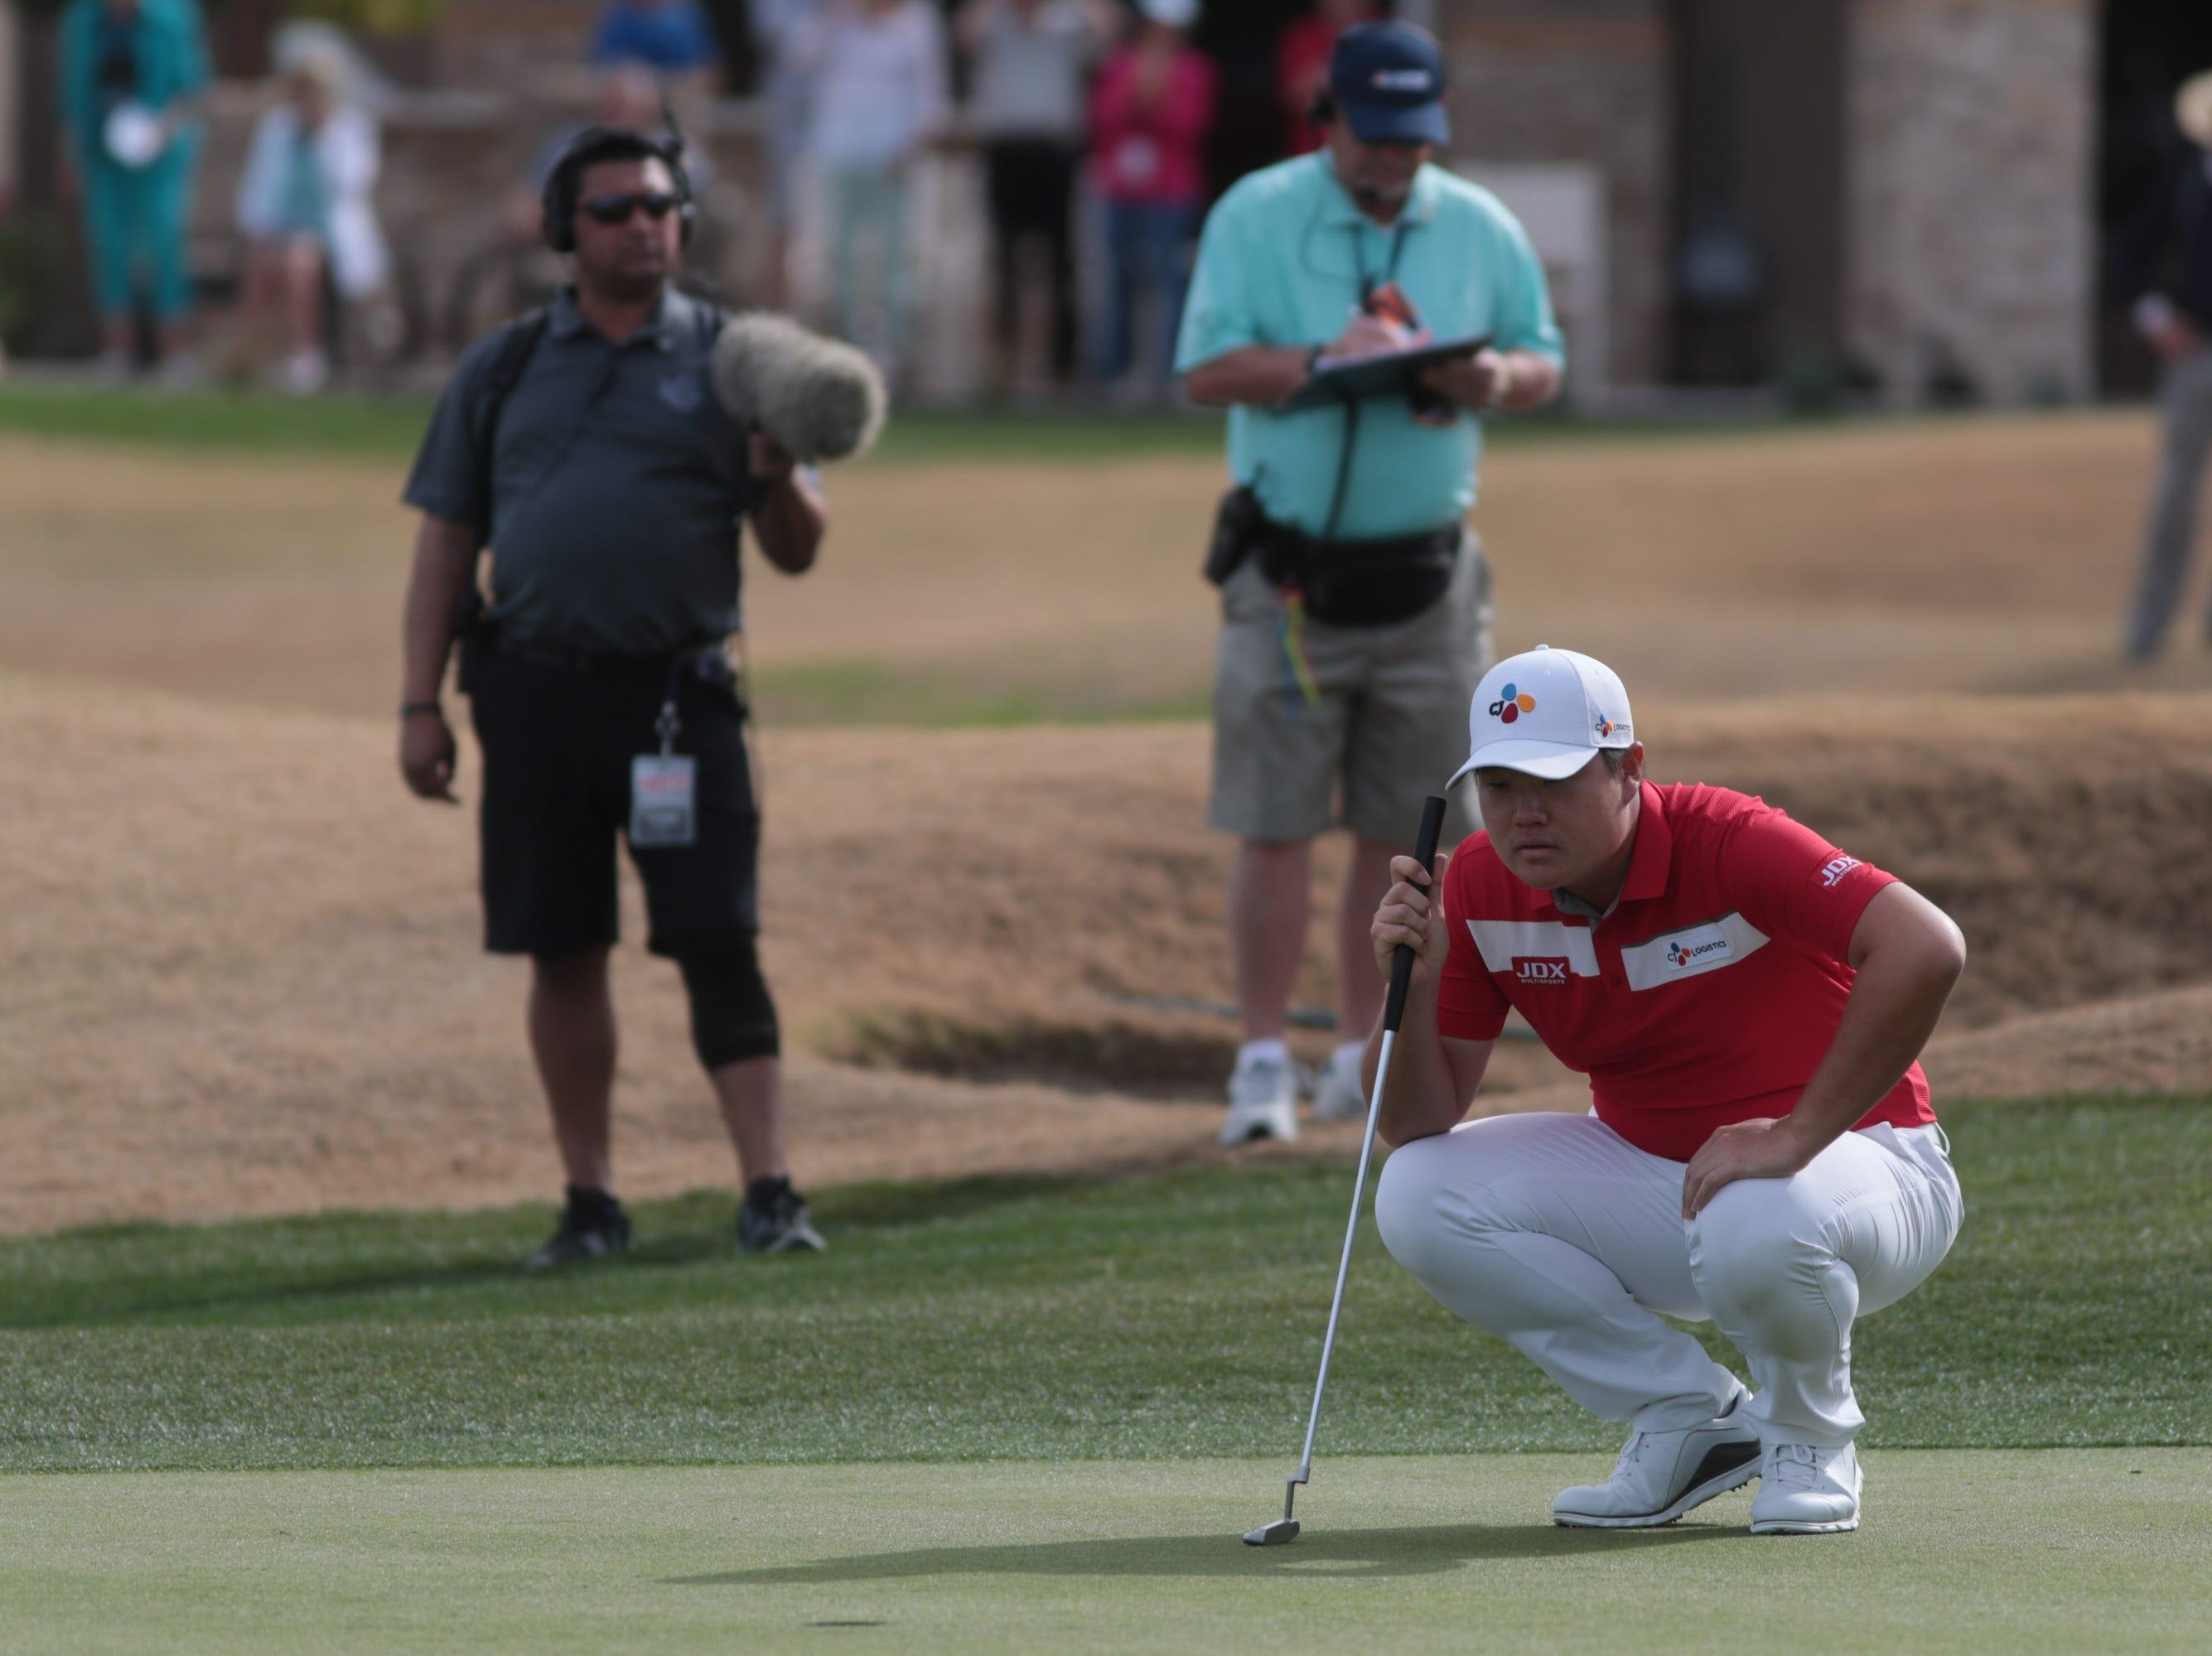 Sungjae Im putts on the 7th hole of the 2019 Desert Classic, Sunday, January 20, 2019.